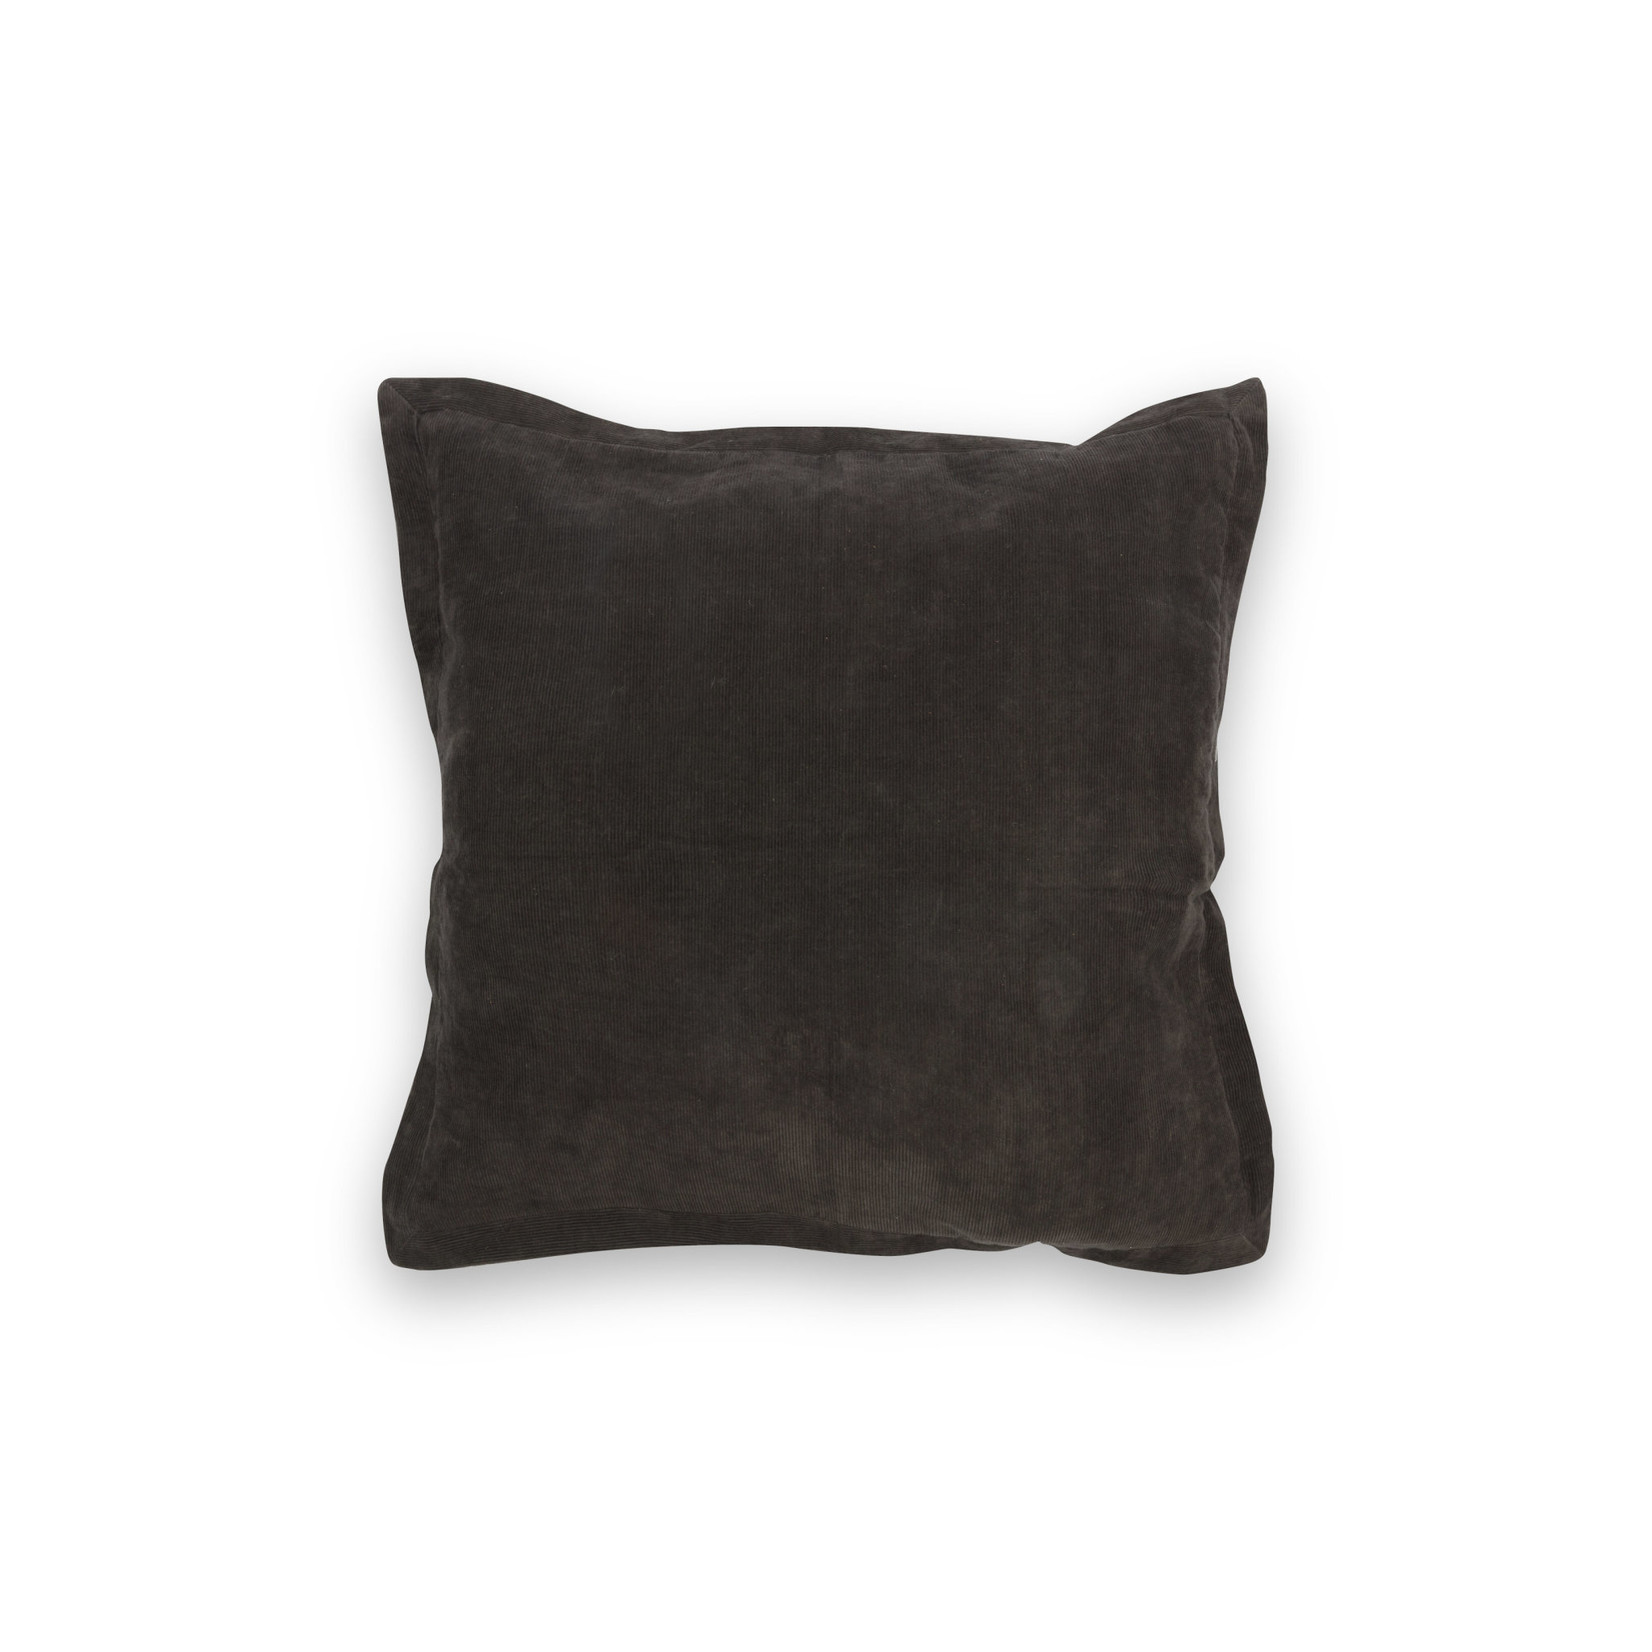 vtwonen Vtwonen   Cushion Rib Cord Open Volant Dark Brown 50x50cm